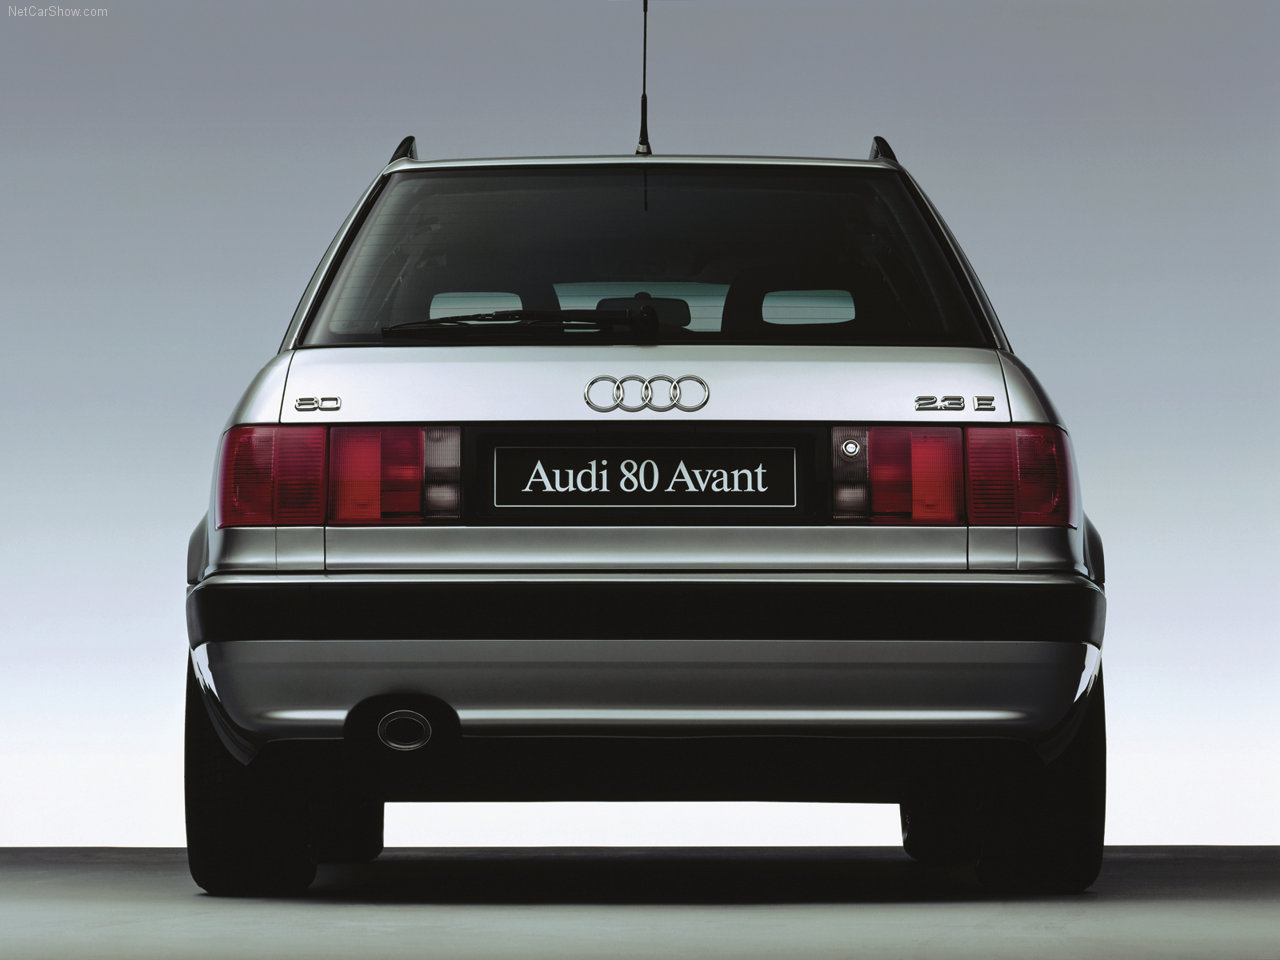 Audi 80 Avant 1991 Audi-80_Avant-1991-1280-05